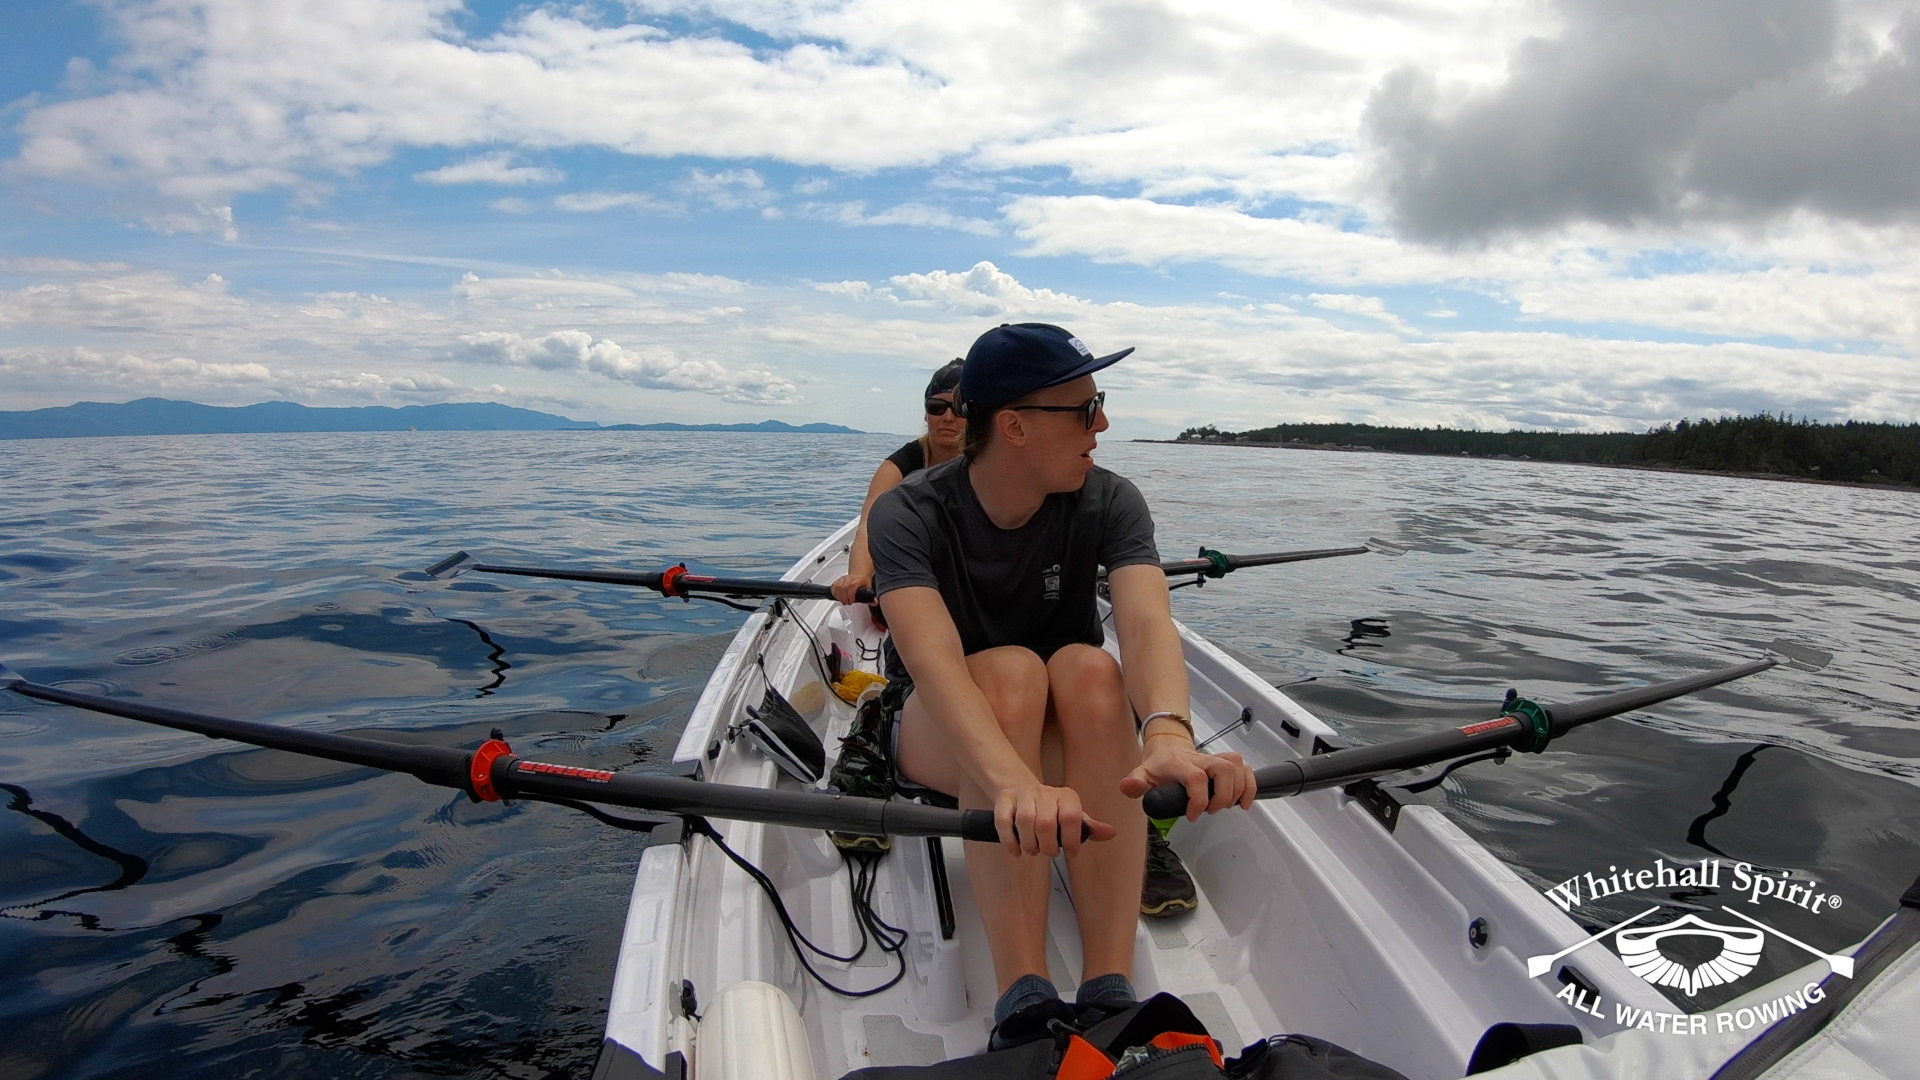 James-Jones-Diana-Lesieur-Whitehall-Rowing-and-Sail-Hornby-Island